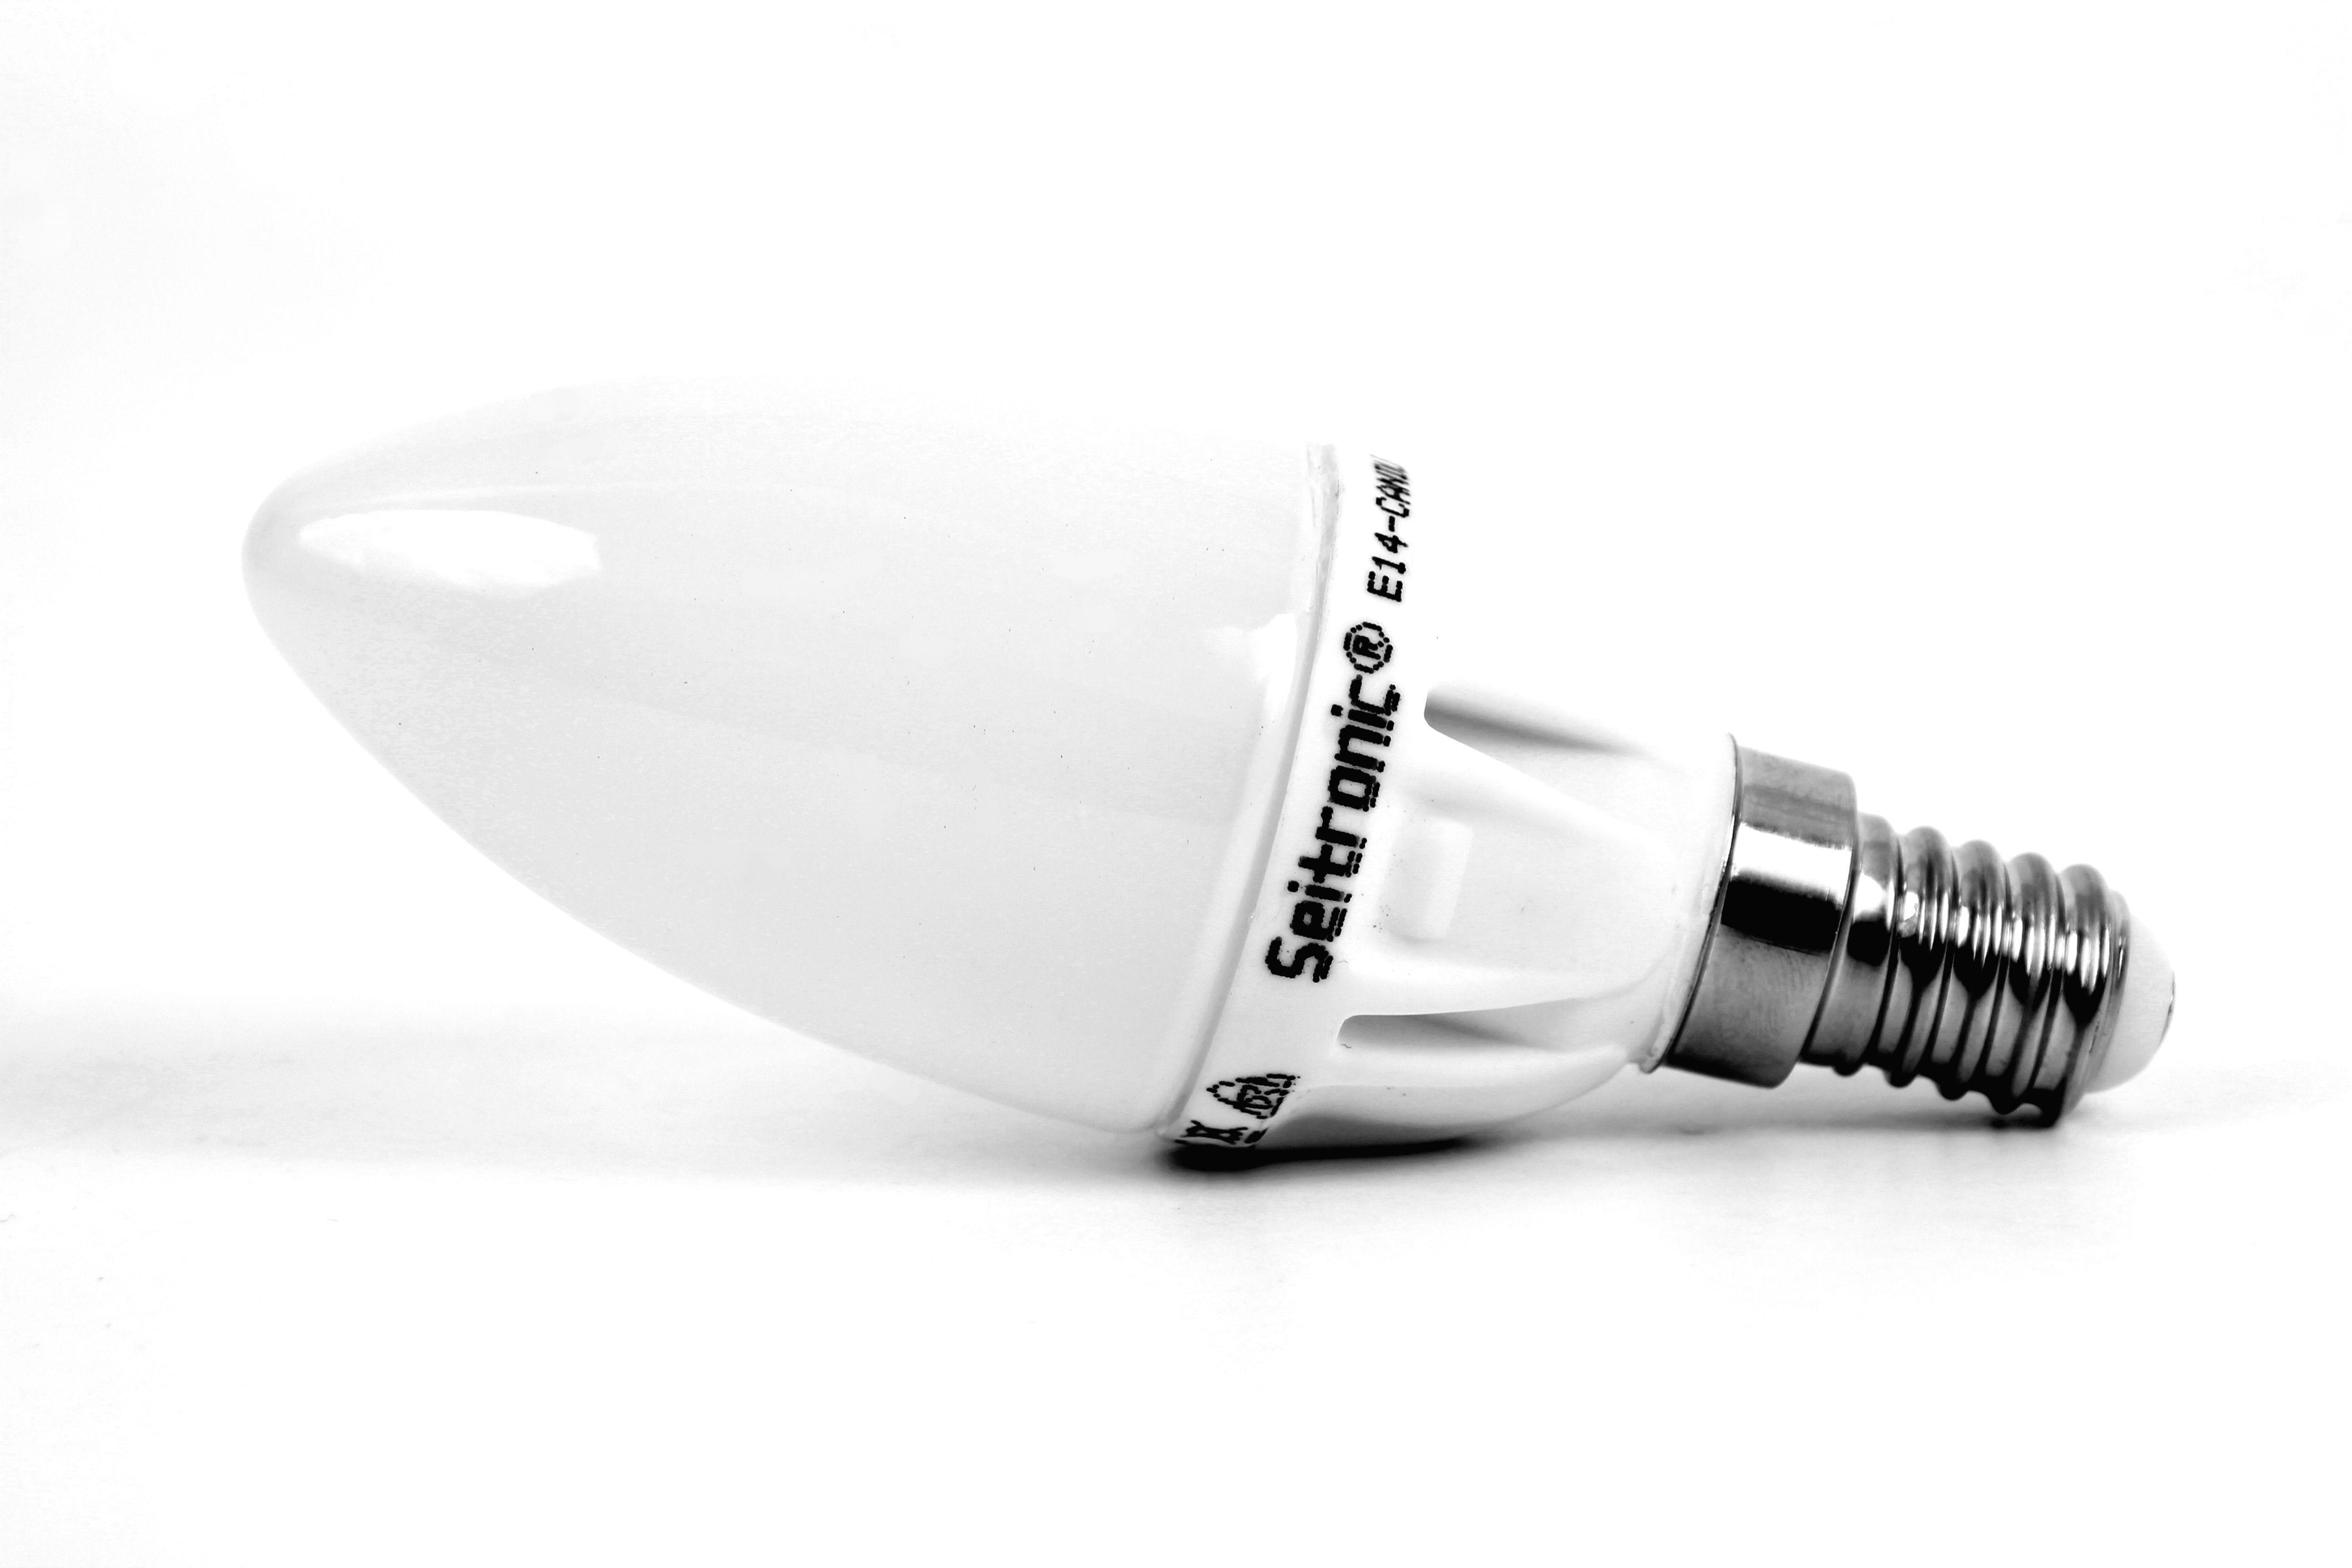 v2_candle_e14_led_leuchtmittel_seitronic_-_3_watt_250lm_3000k_8_leds_warm-weiss_4966_1 Luxus Led Lampe 3 Watt Dekorationen